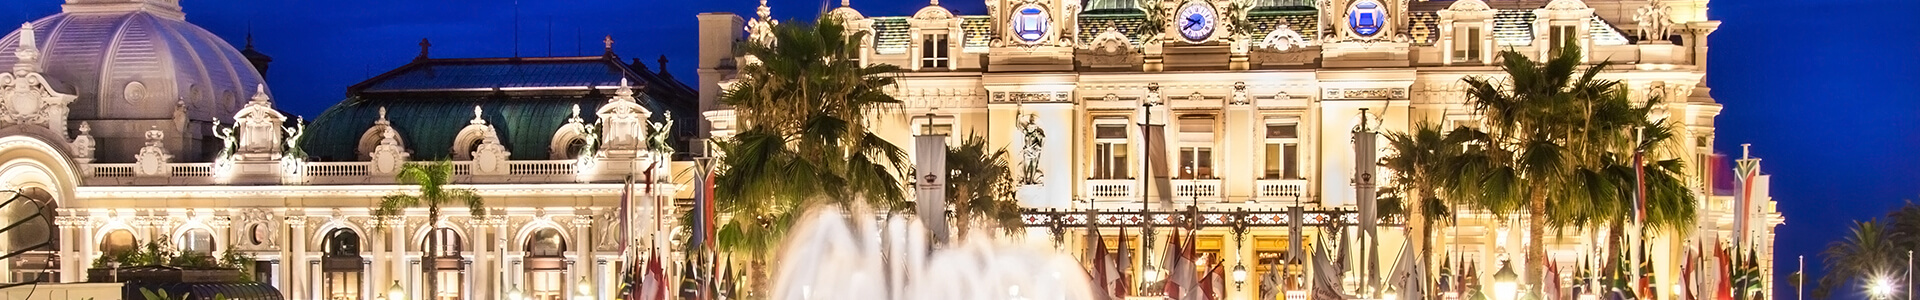 sverigevegas-monte-carlo-casino